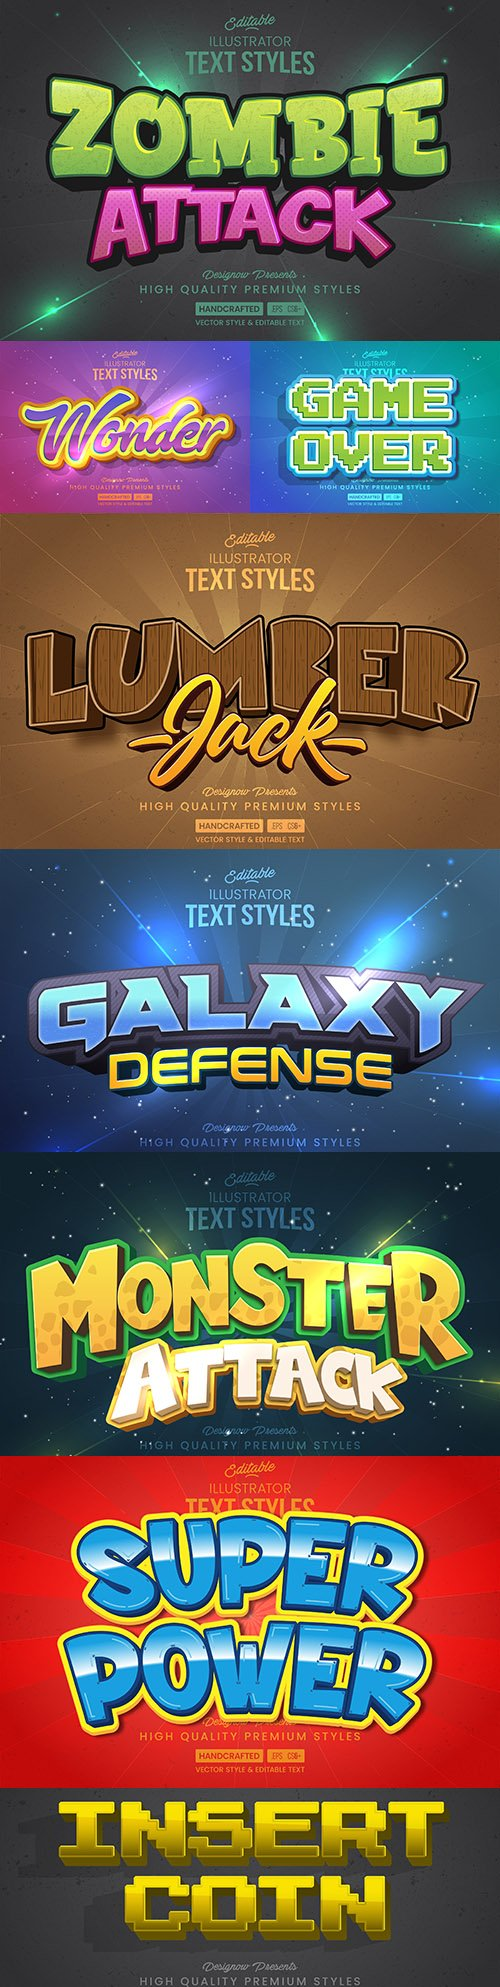 Editable font effect text collection illustration design 155